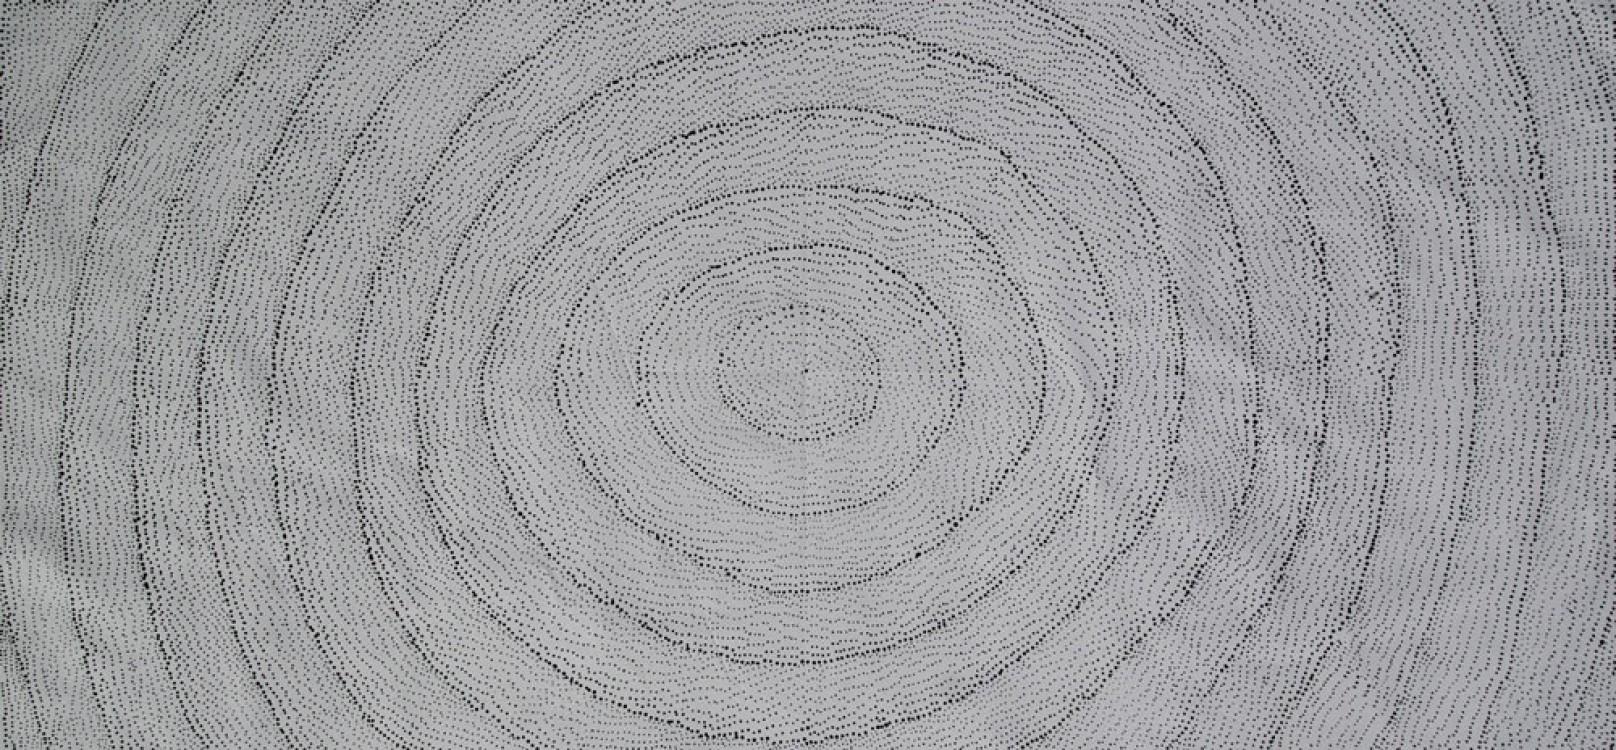 Lily Kelly Napangardi Rock Holes Australian Aboriginal Art Painting on canvas LK1900